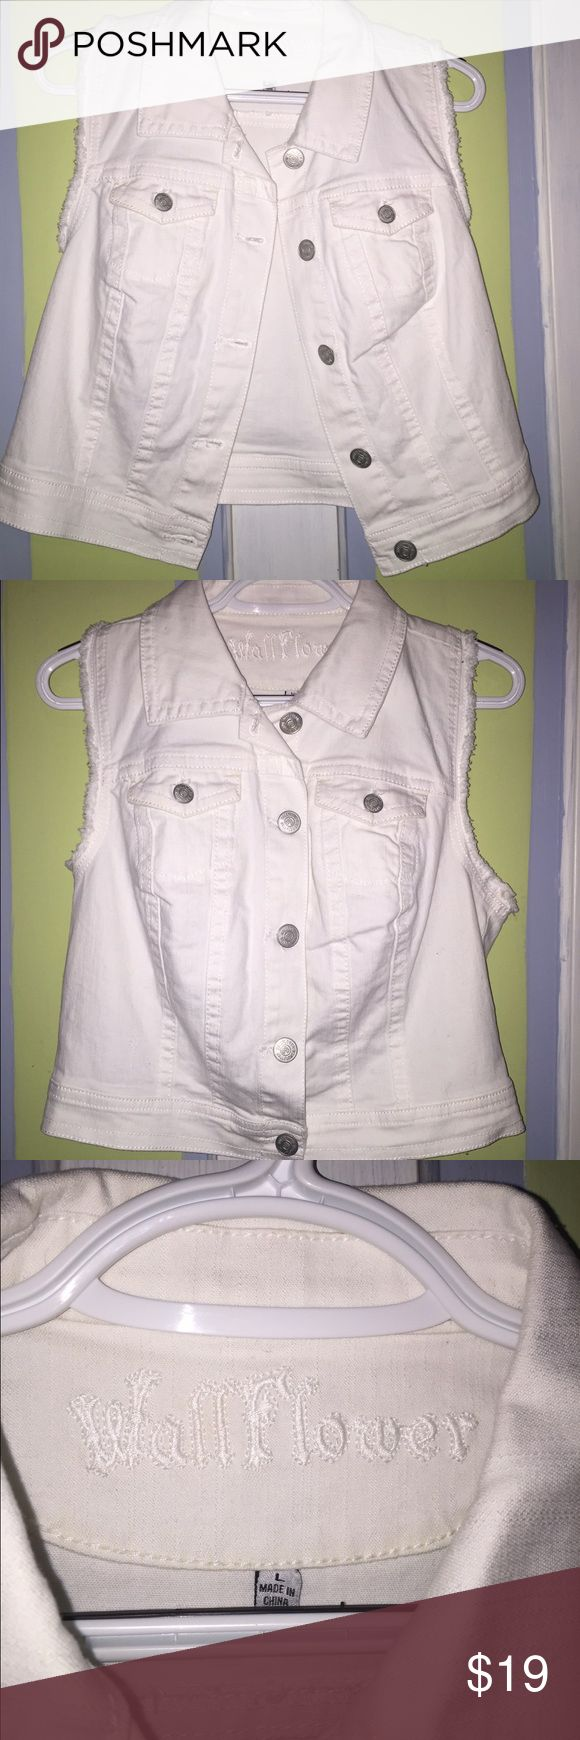 White Jean Vest Cute white jean vest! It is a little shorter 😊 looks great with a long sleeve dress or tank top! Size large Wallflower Jackets & Coats Vests